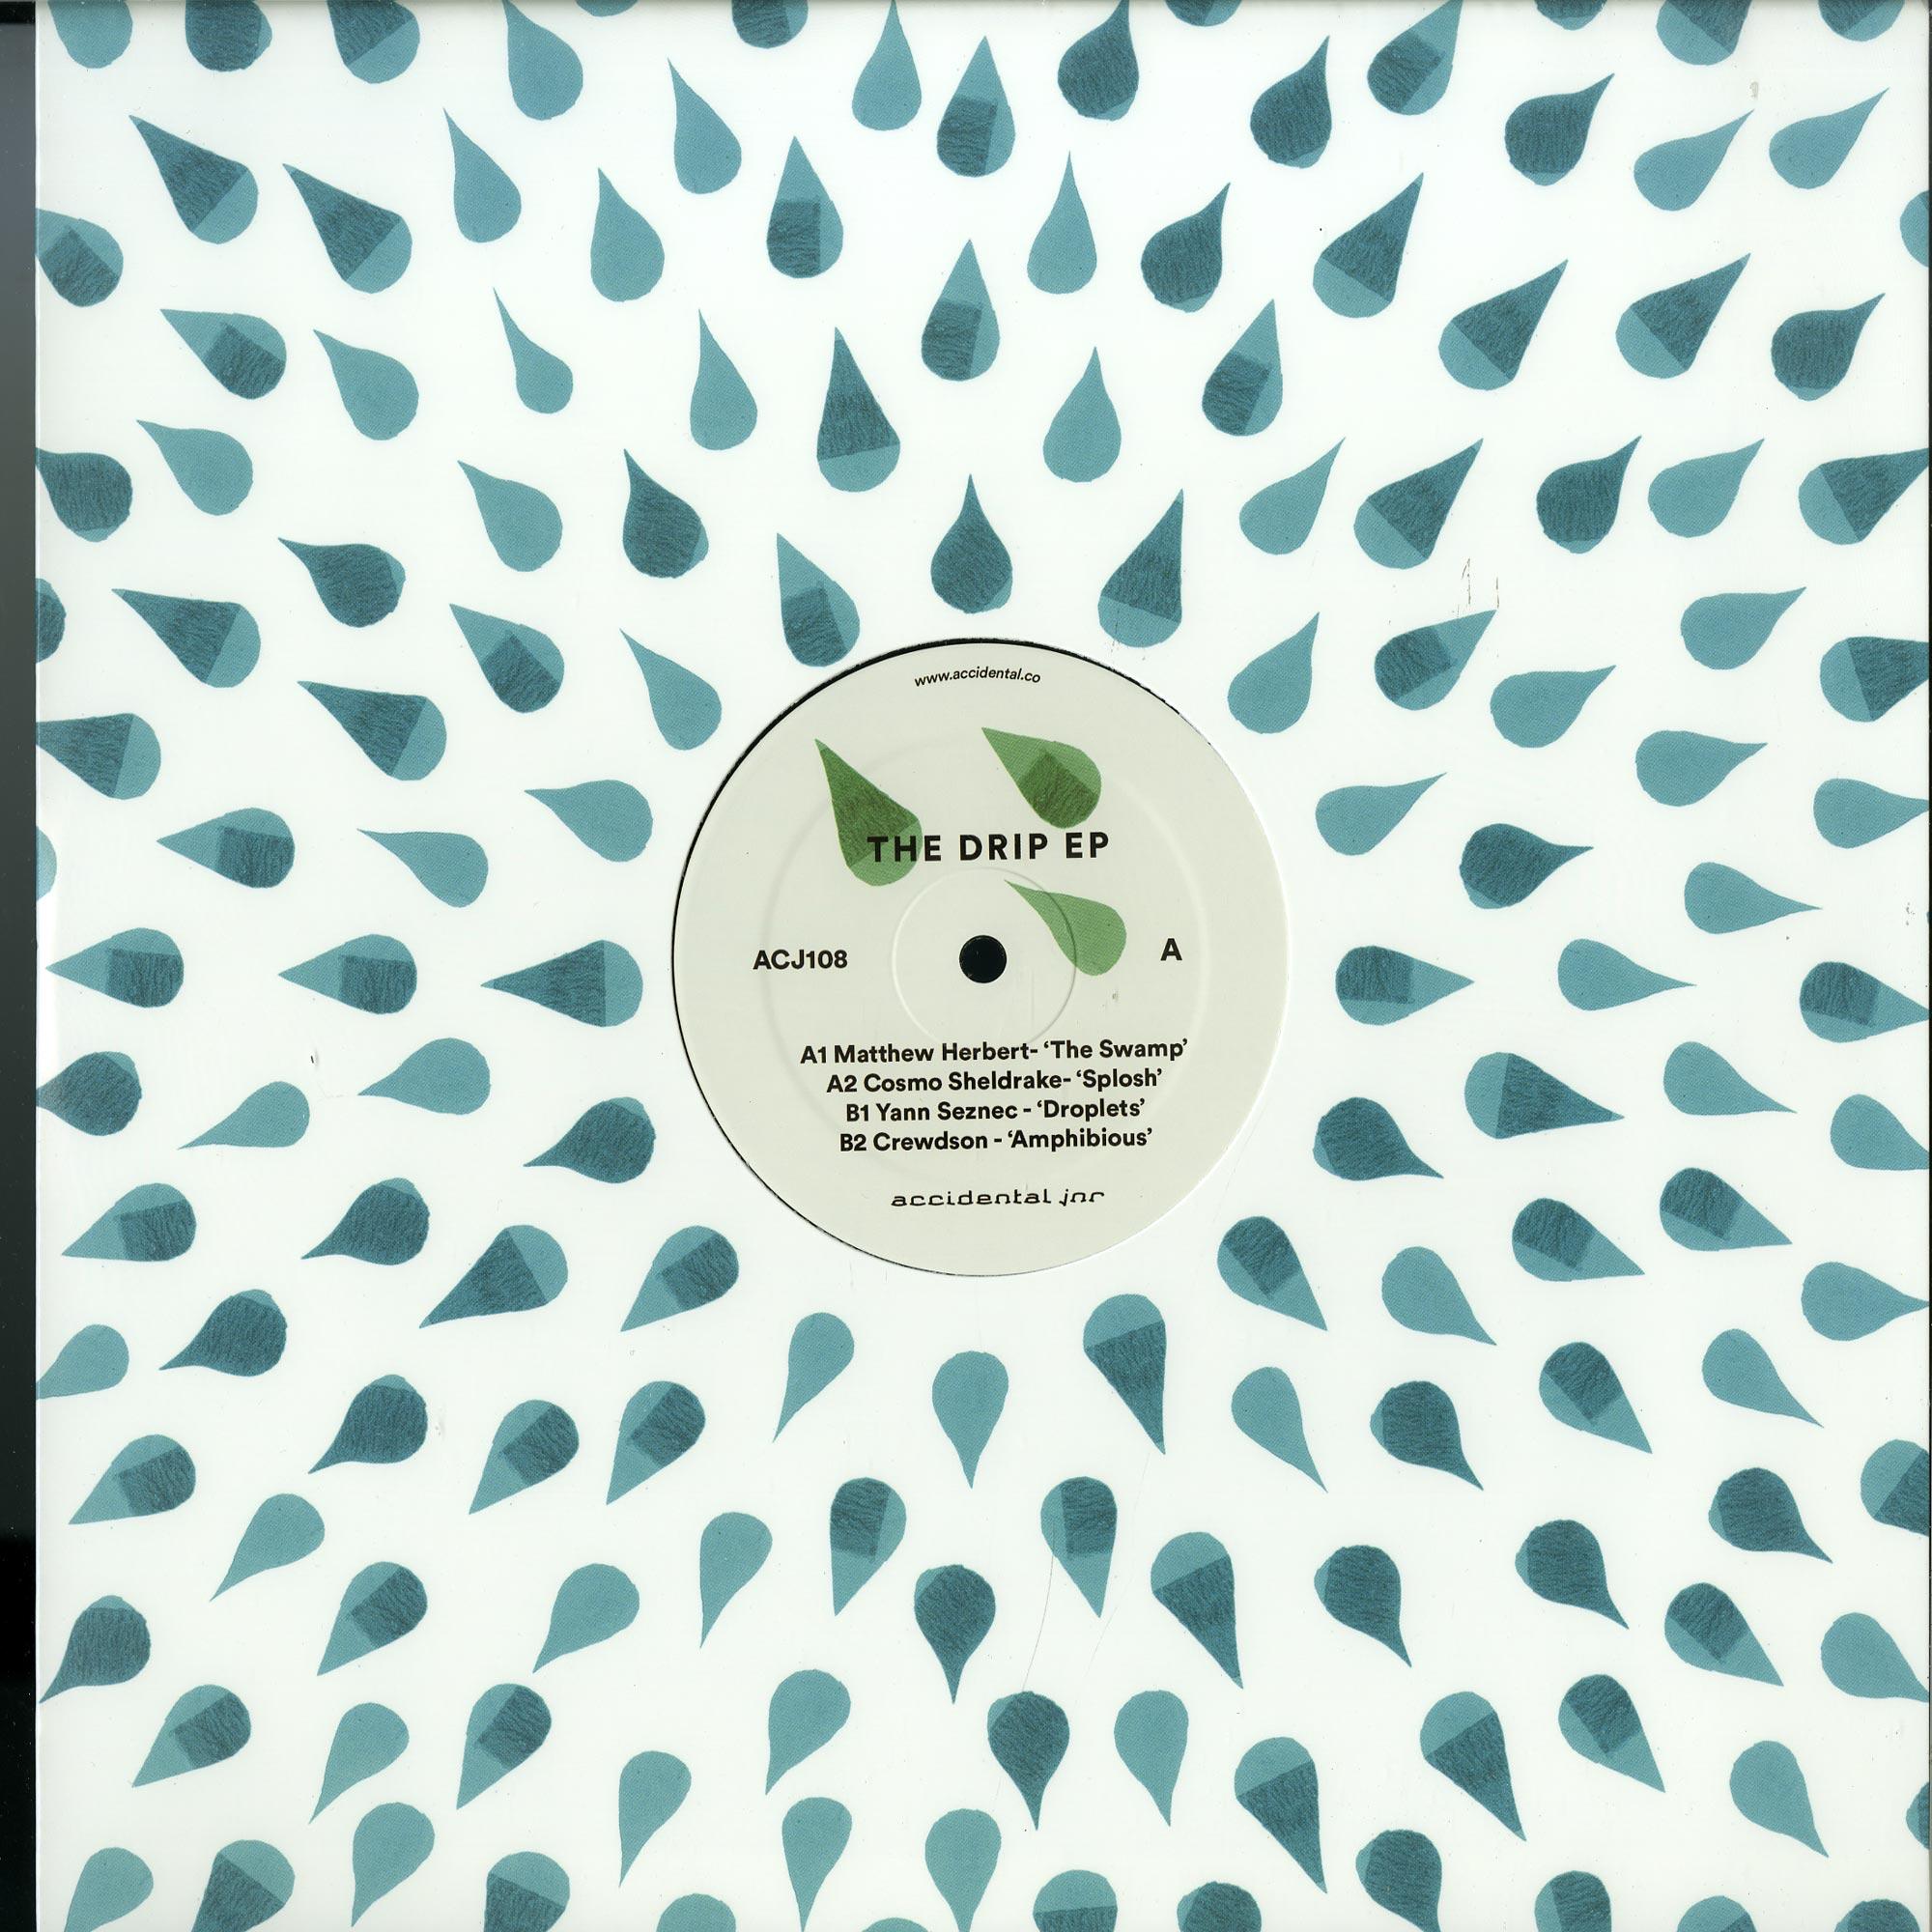 Matthew Herbert - Cosmo Sheldrake - Yann Seznec - Crewdson - THE DRIP EP